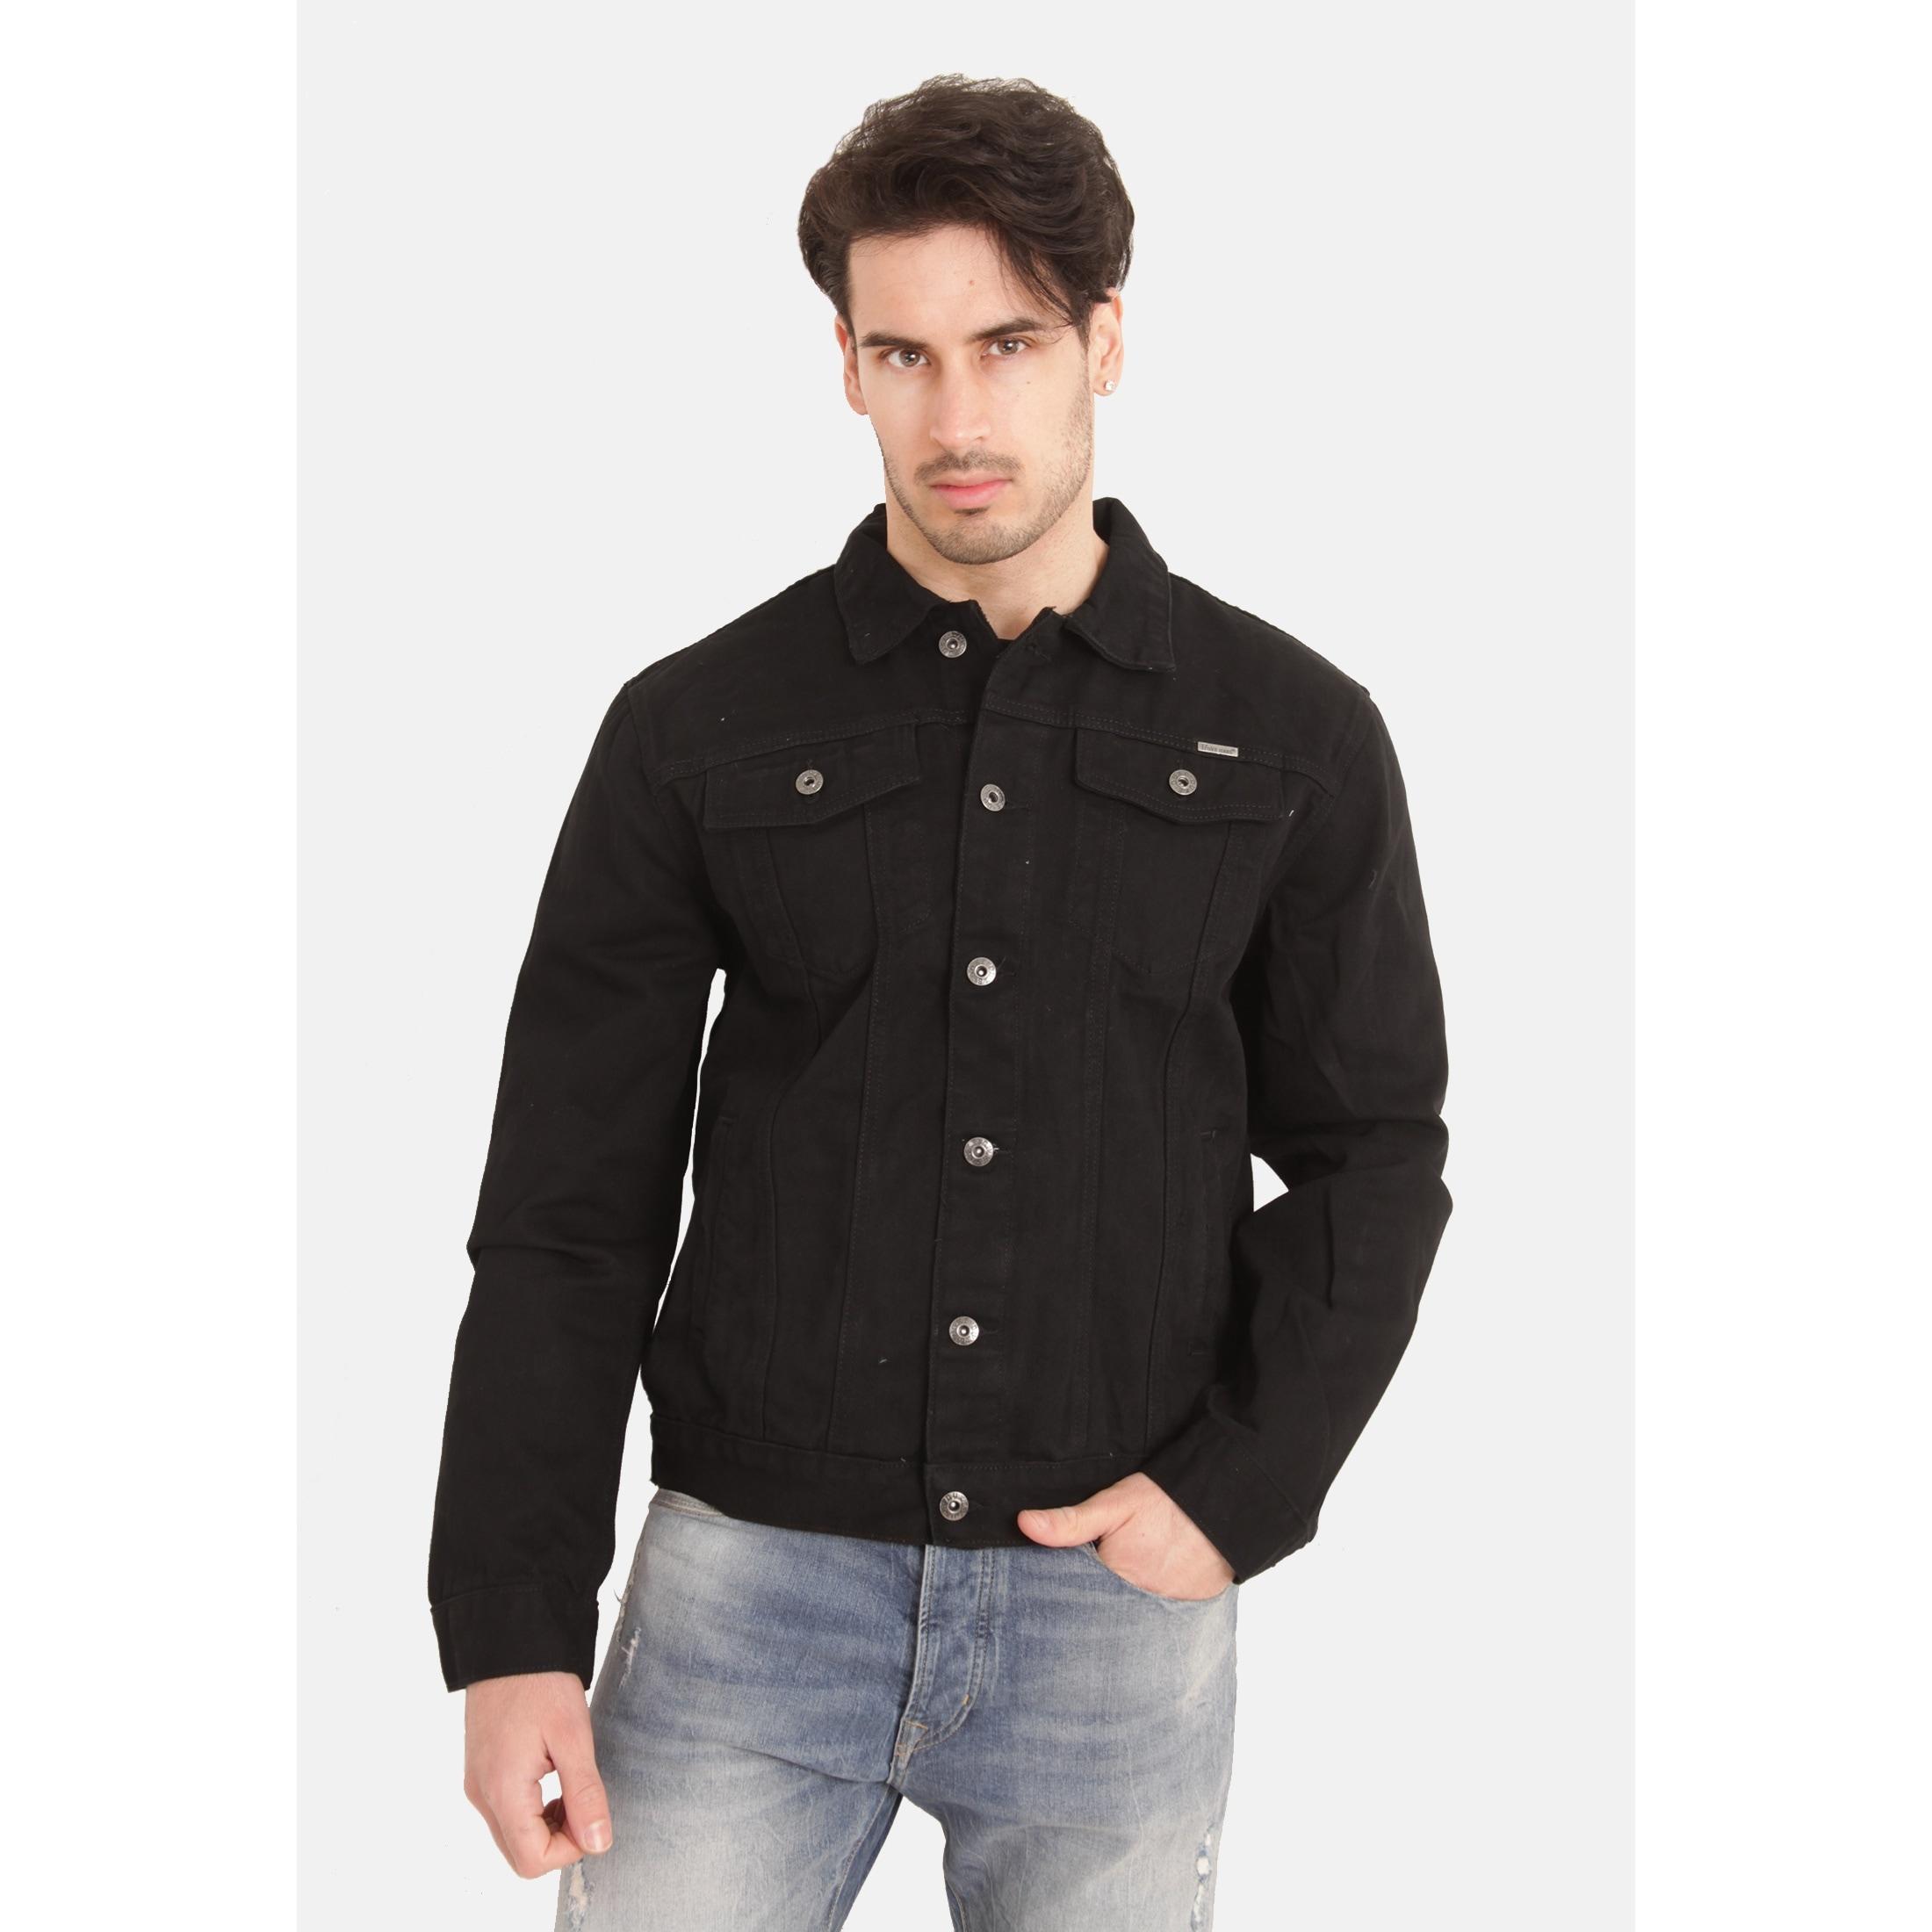 Duke Clothing Jeansjacke | Bekleidung > Jacken > Jeansjacken | Blau | Denim - Baumwolle | Duke Clothing